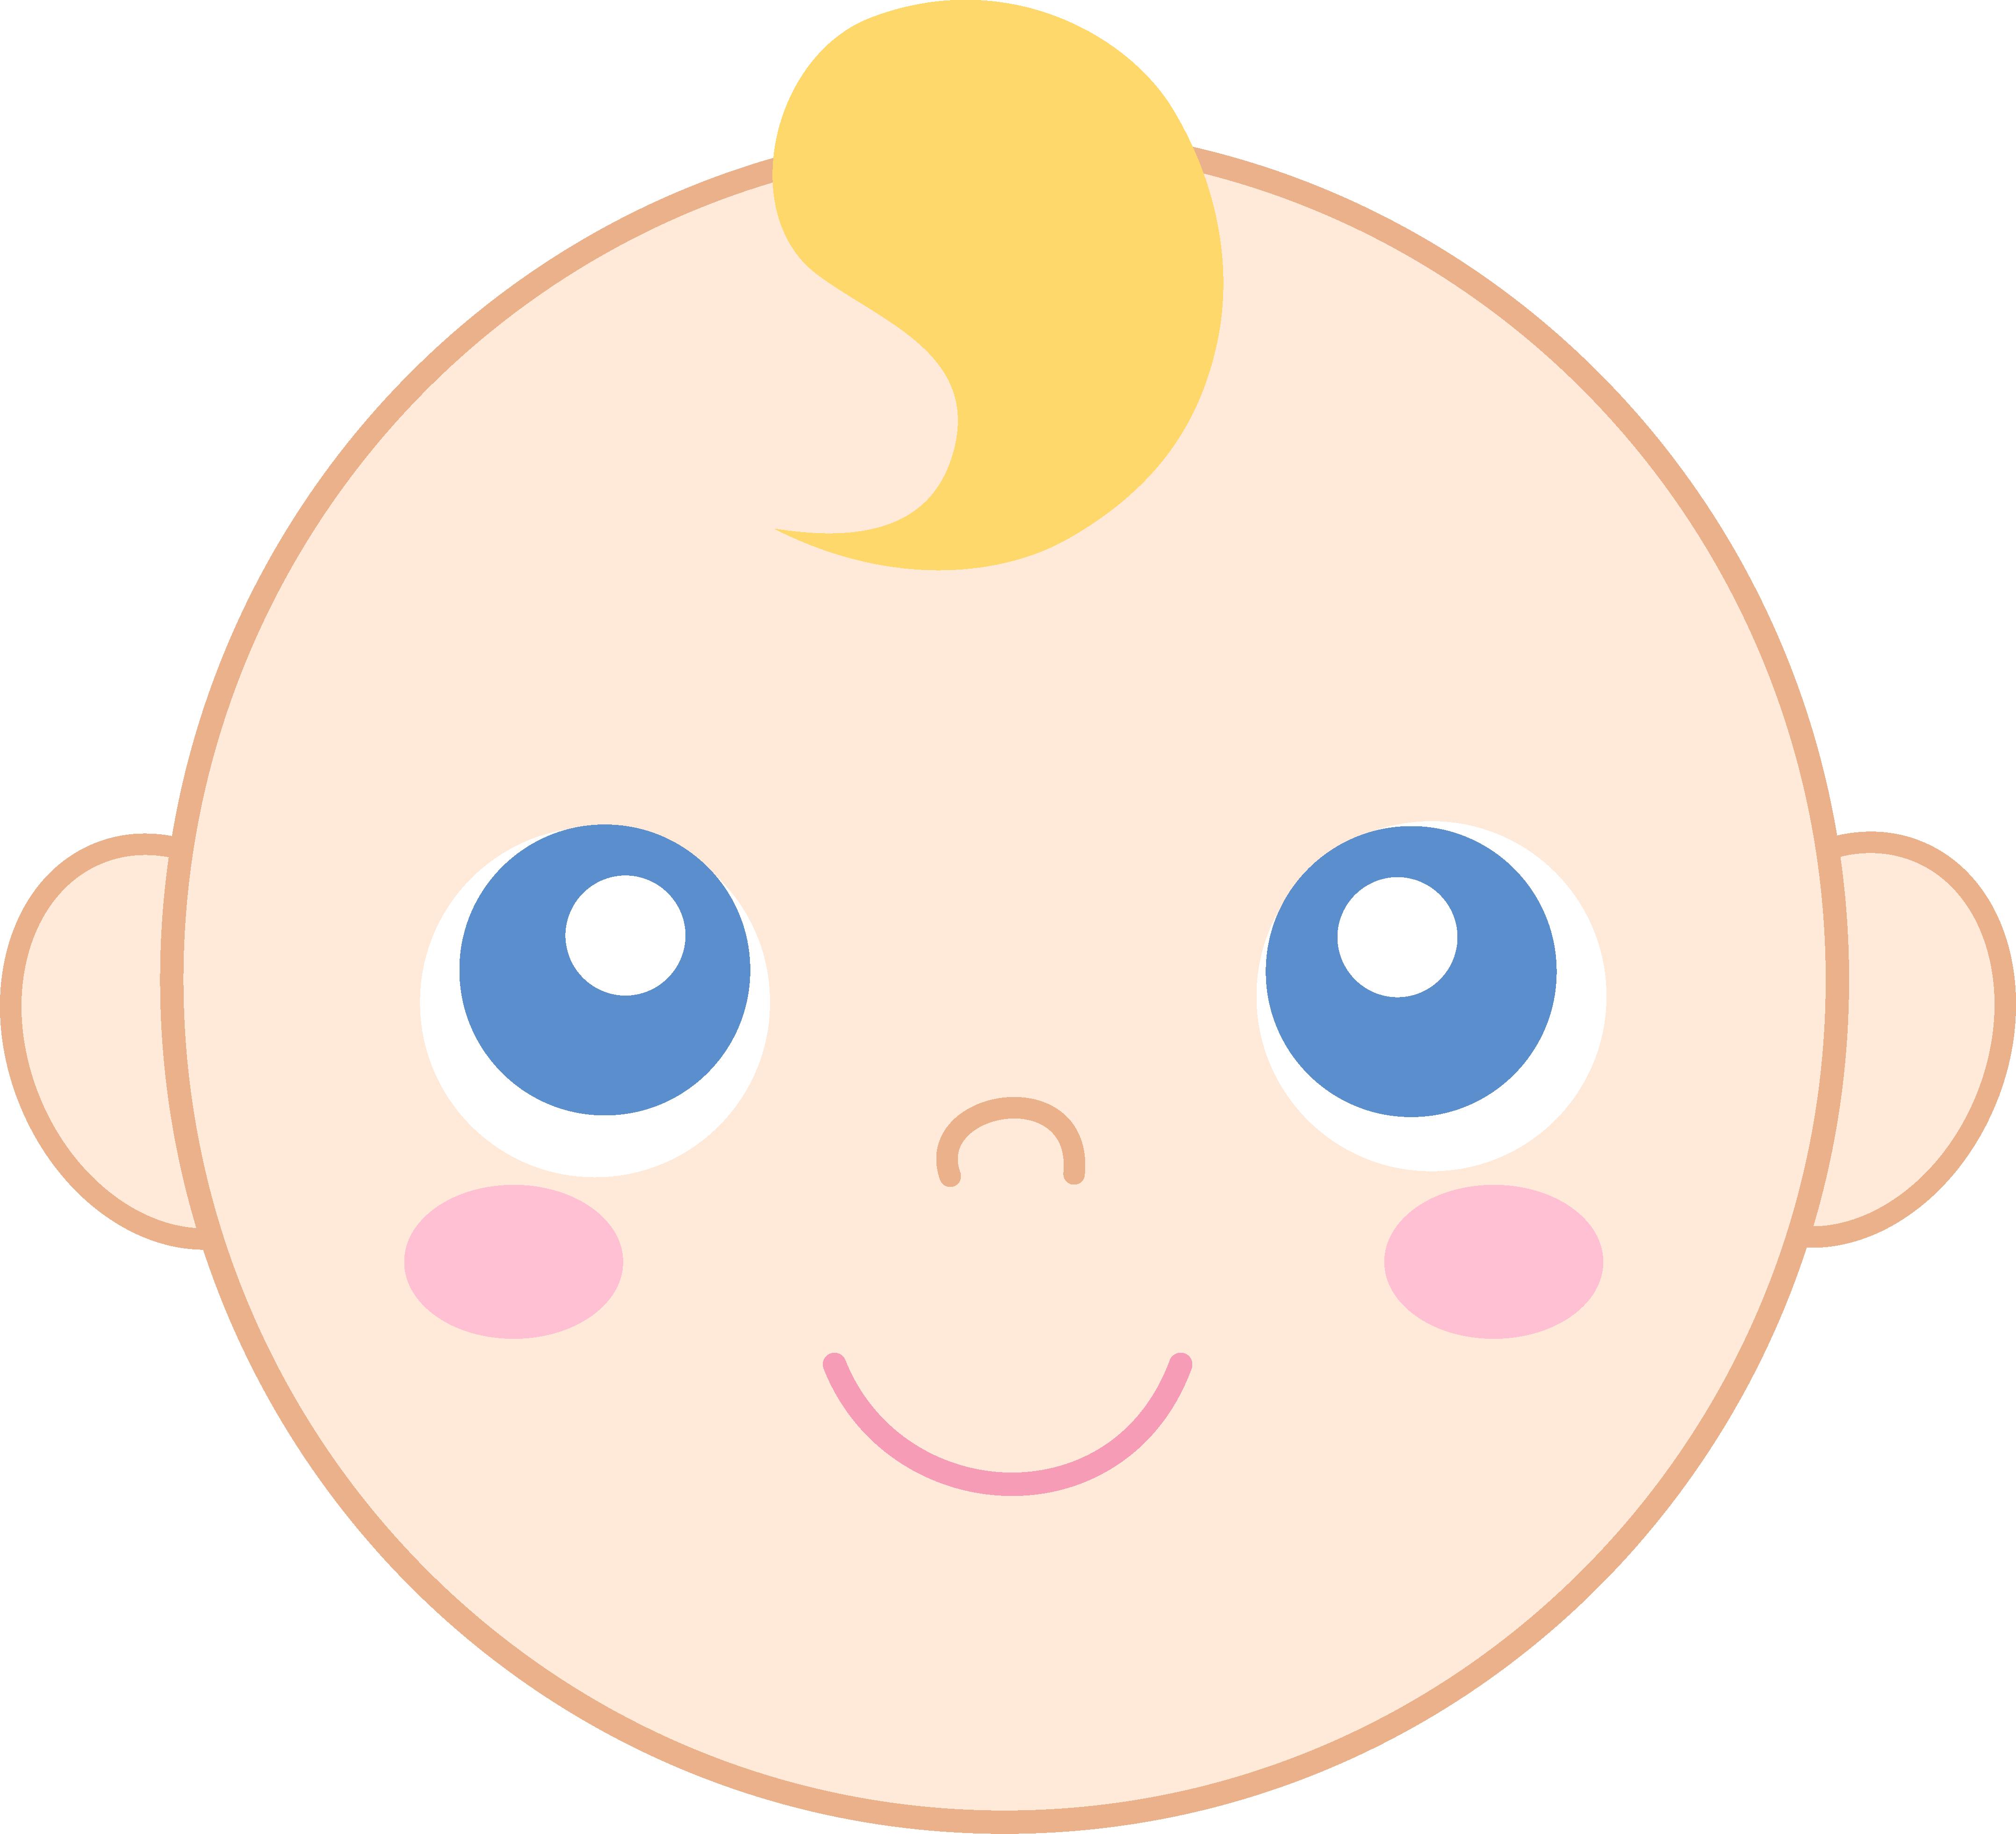 Cute Baby Face Clipart.